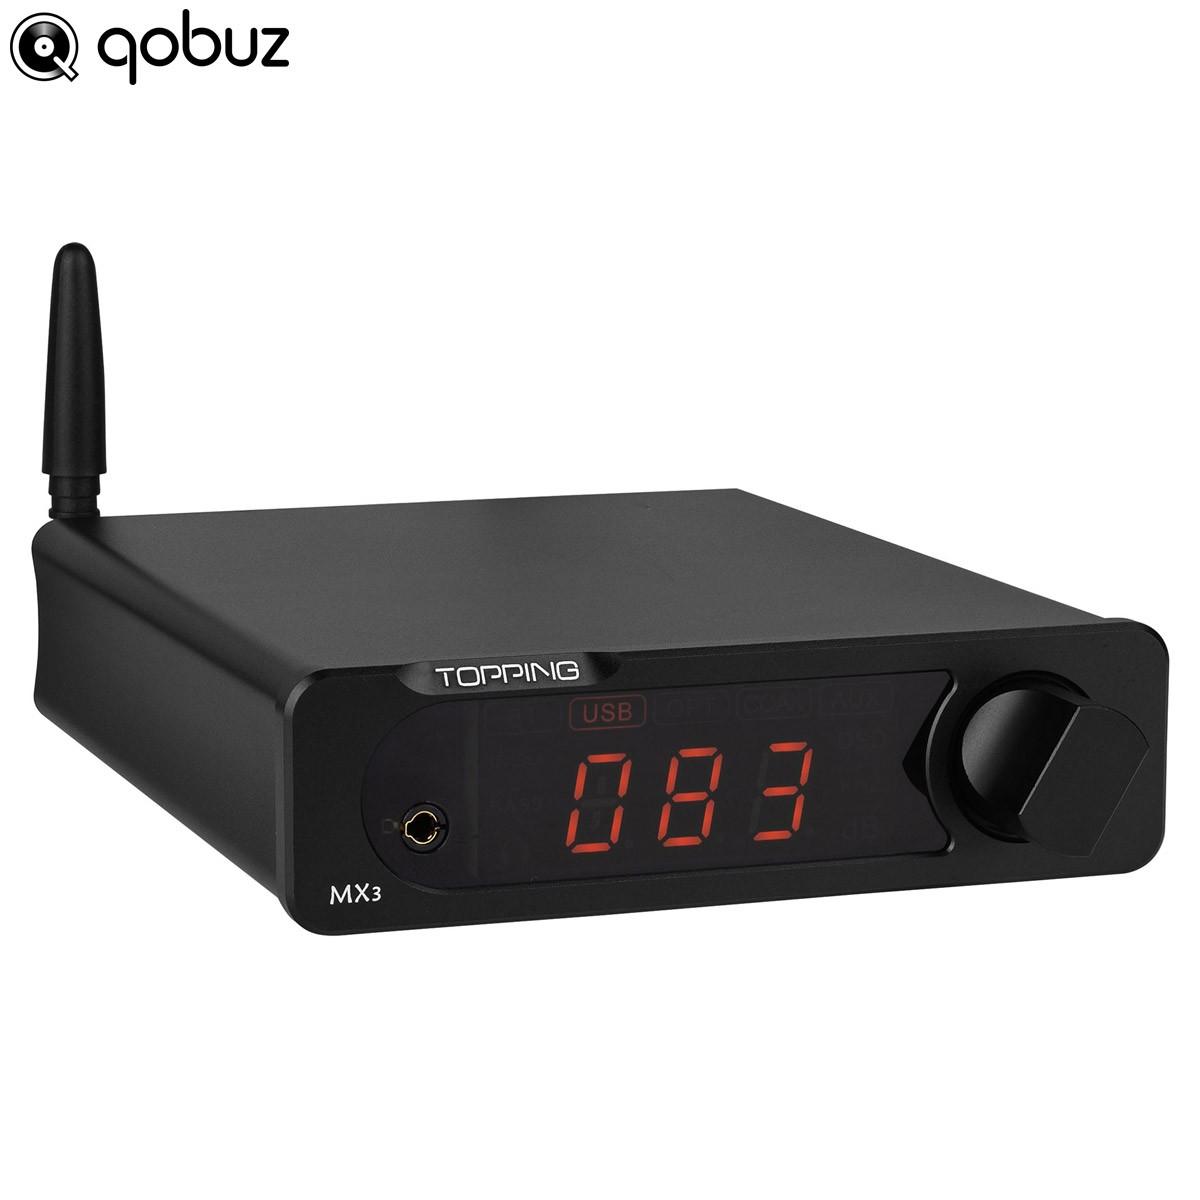 TOPPING MX3 Digital Amplifier Bluetooth 4.0 Class D 2x38W / 8 Ohm Black